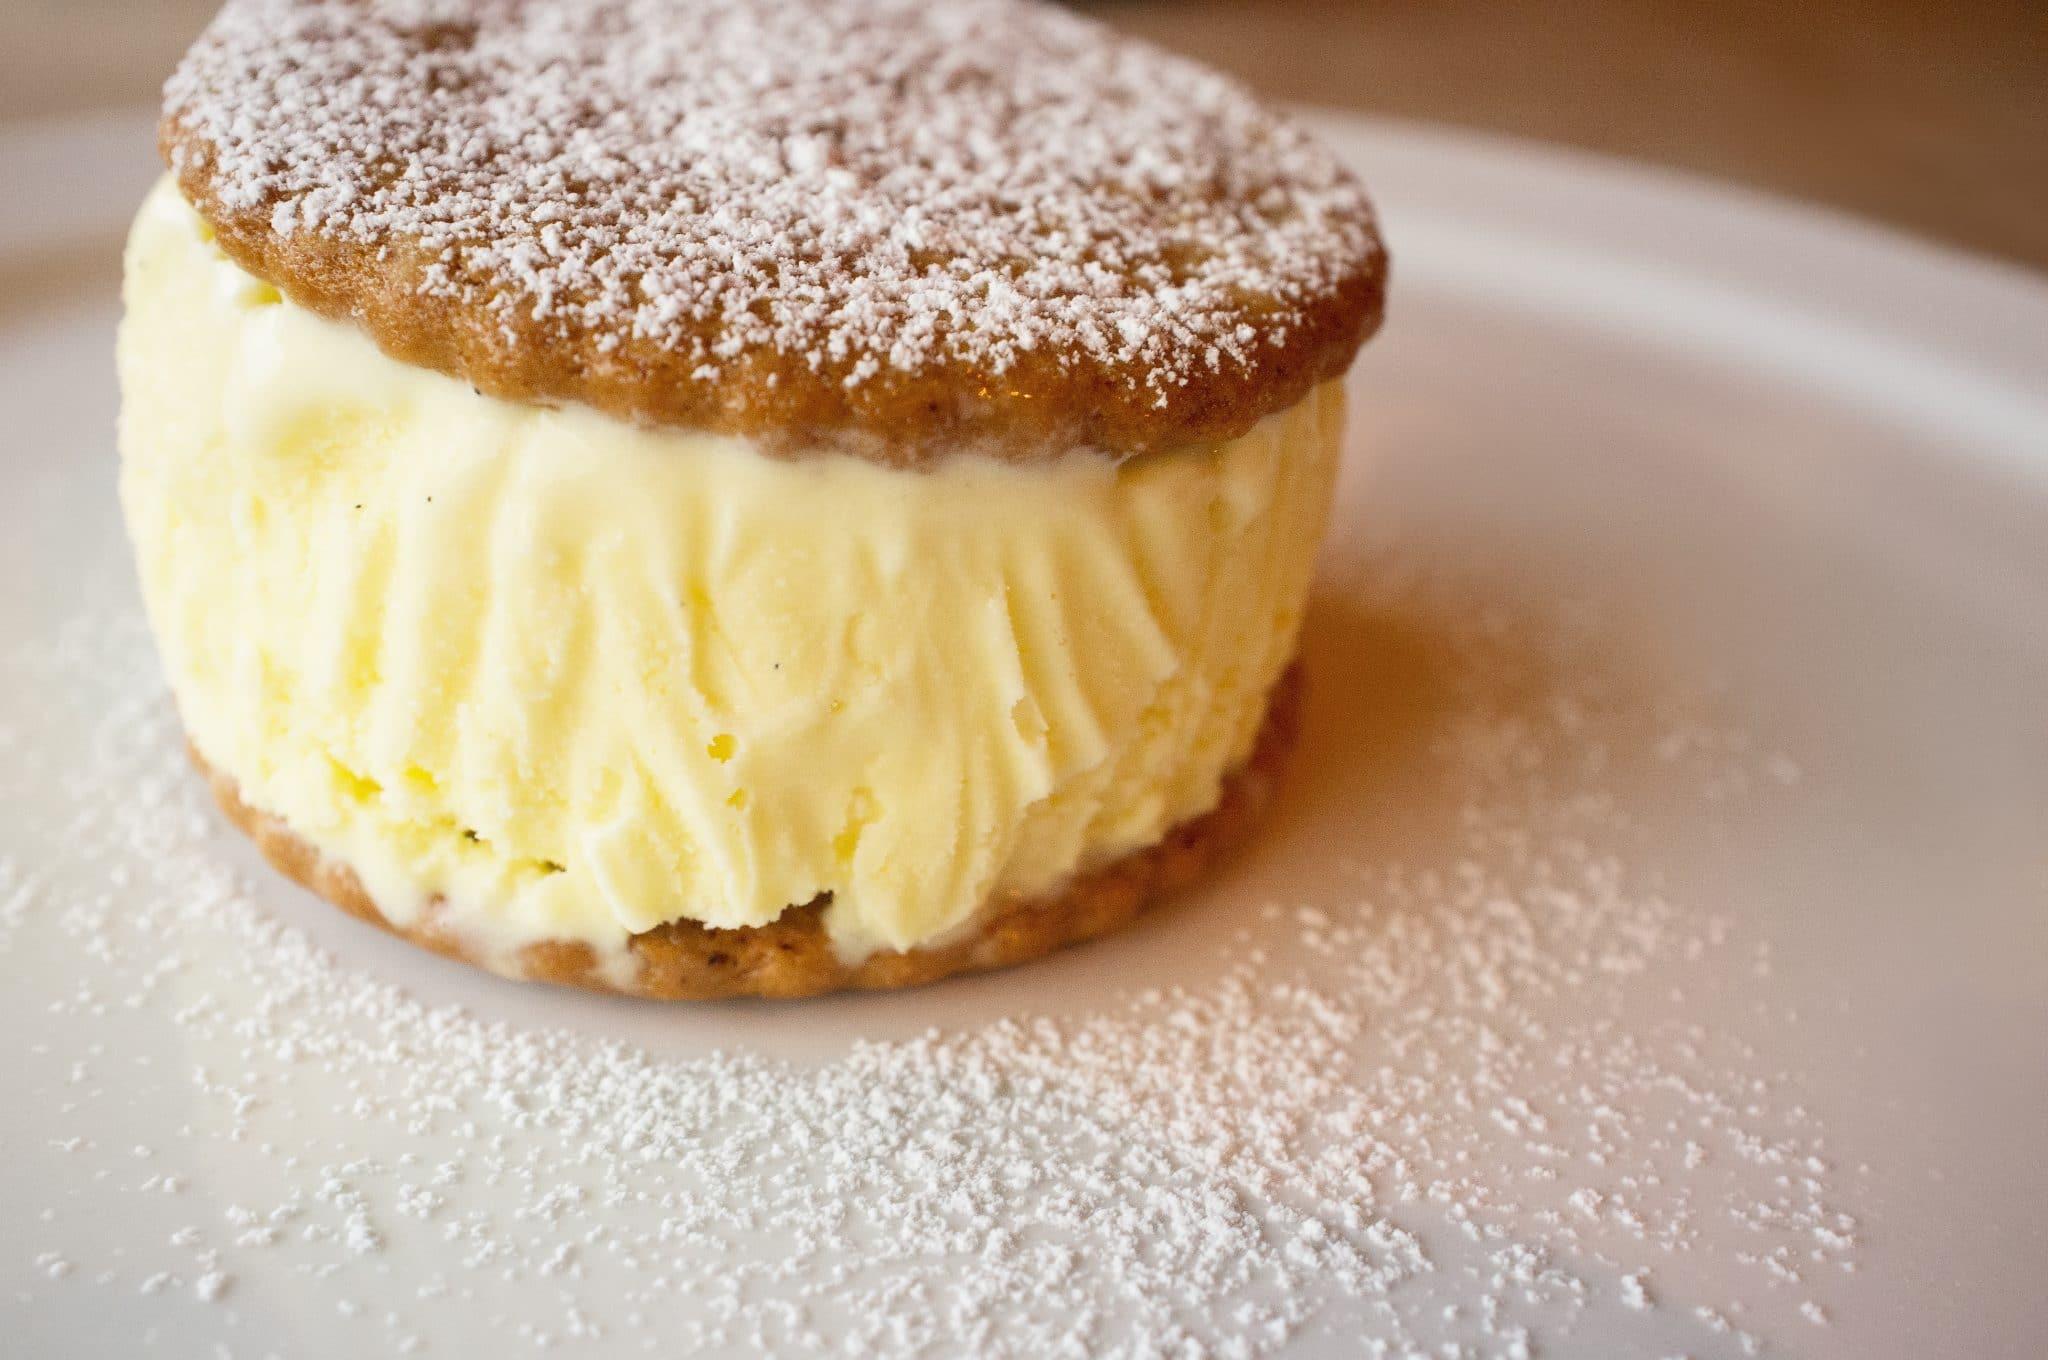 gelato cookie sandwich, gelato wafers